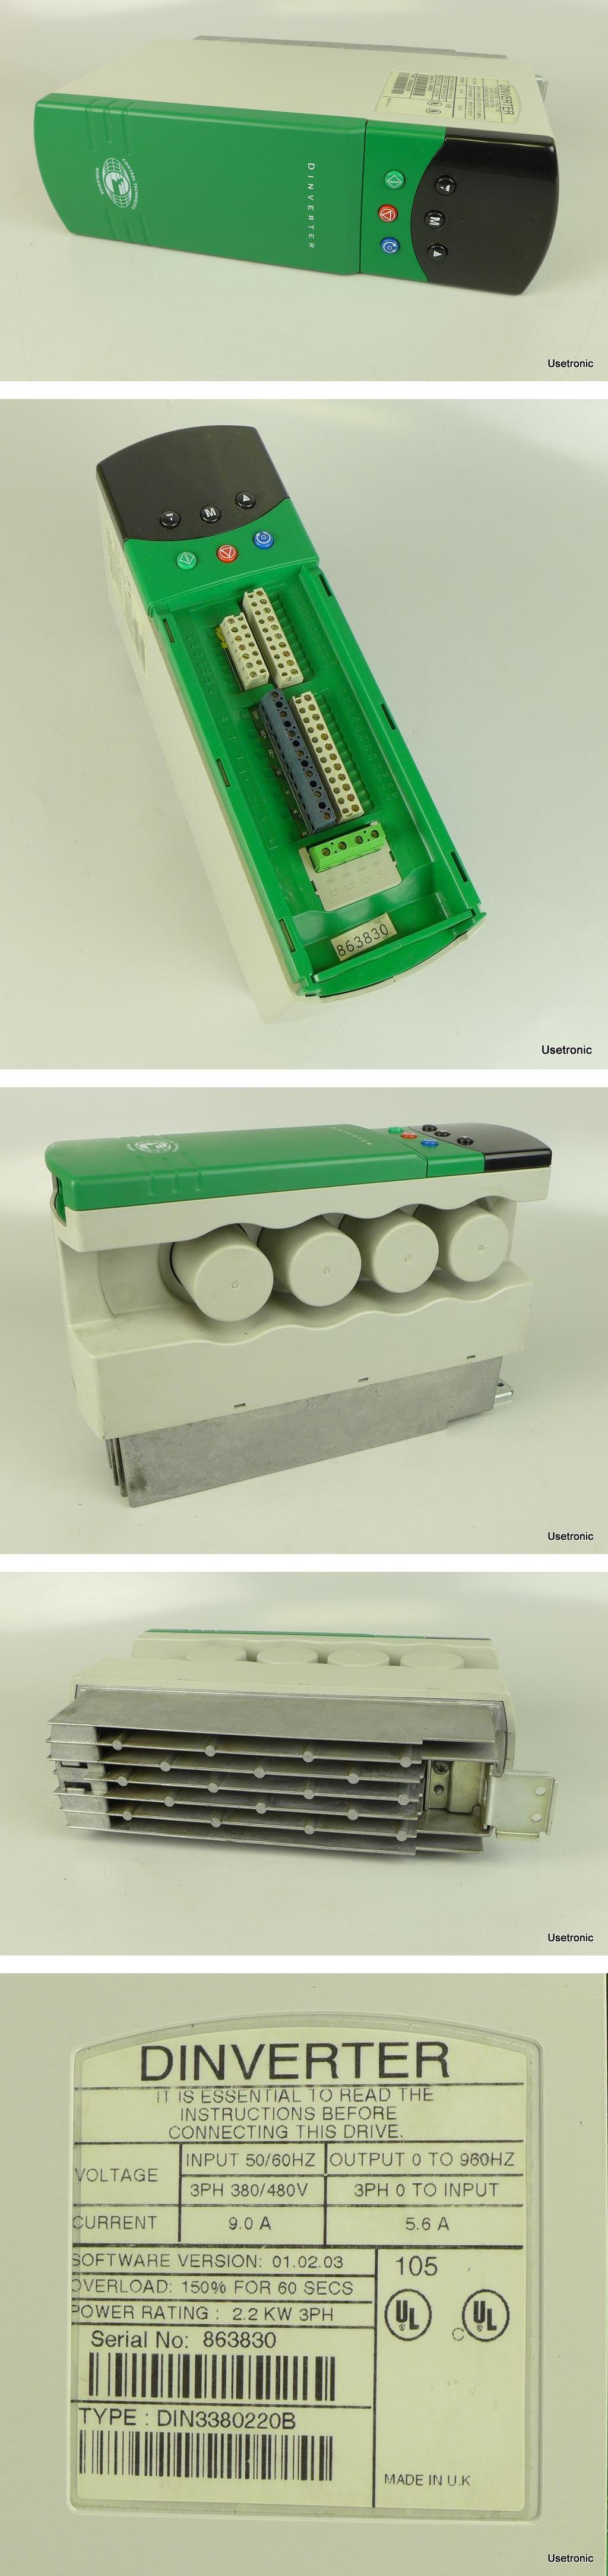 Control Techniques DIN3380220B